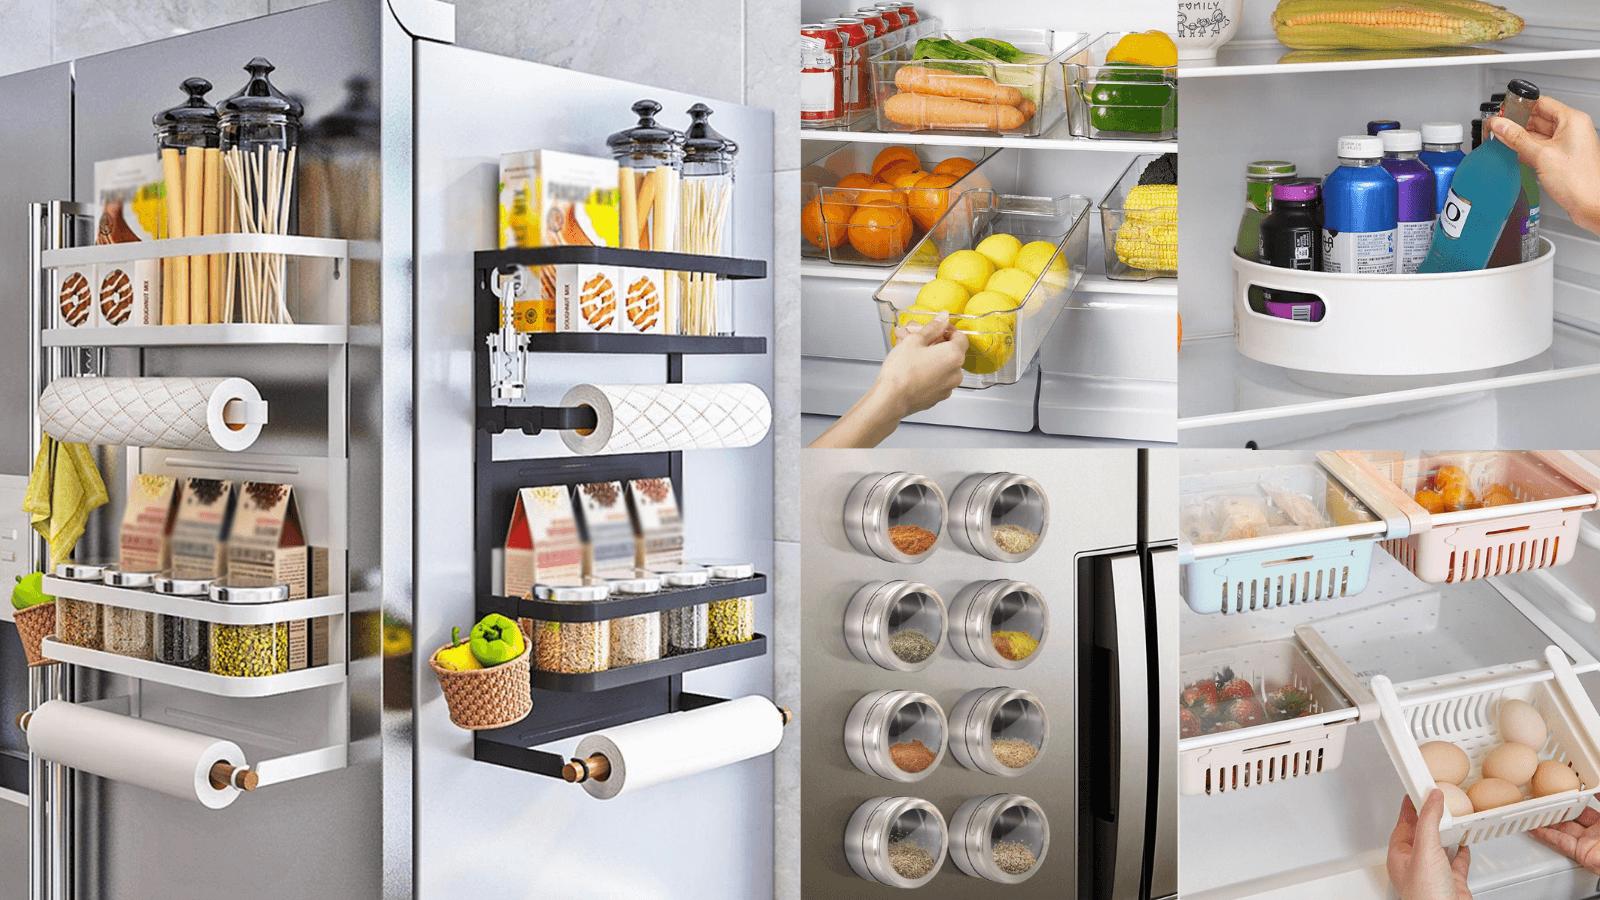 fridge organization ideas.png